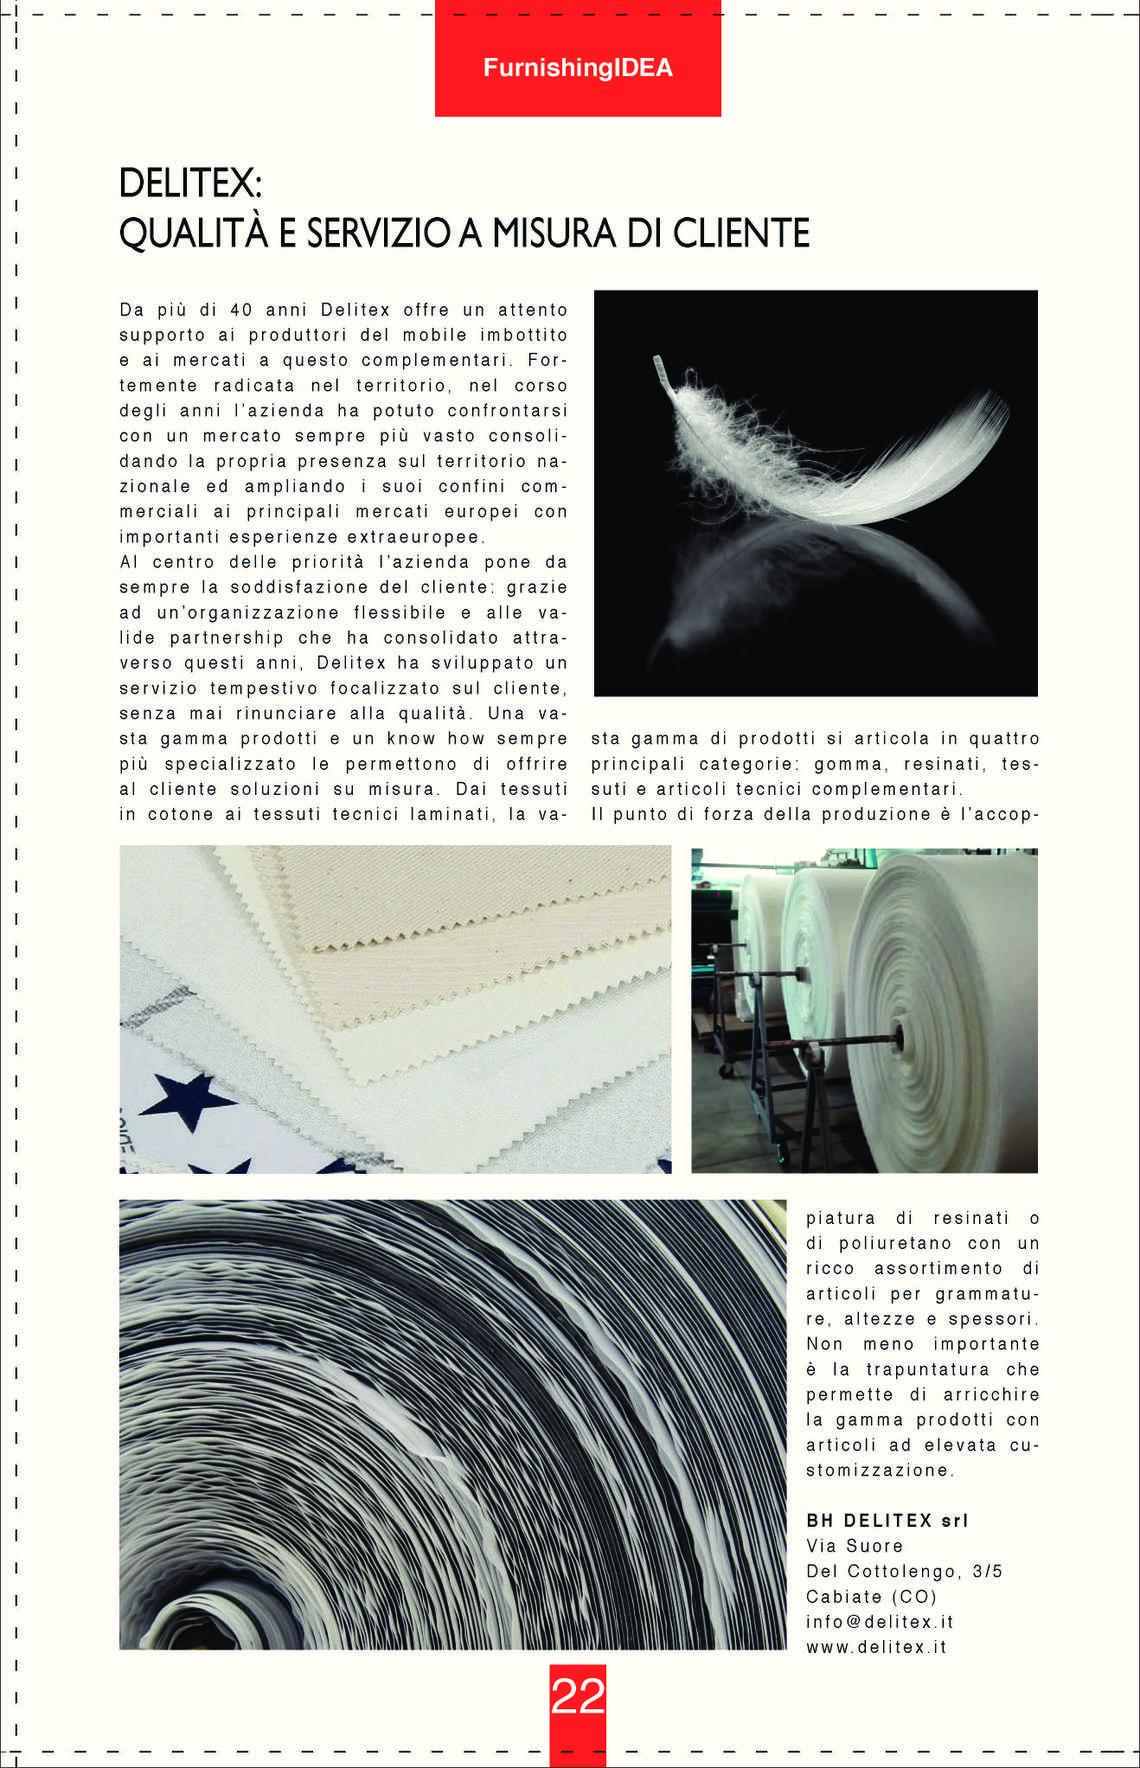 furnishing-idea-journal--1-2018_journal_9_021.jpg